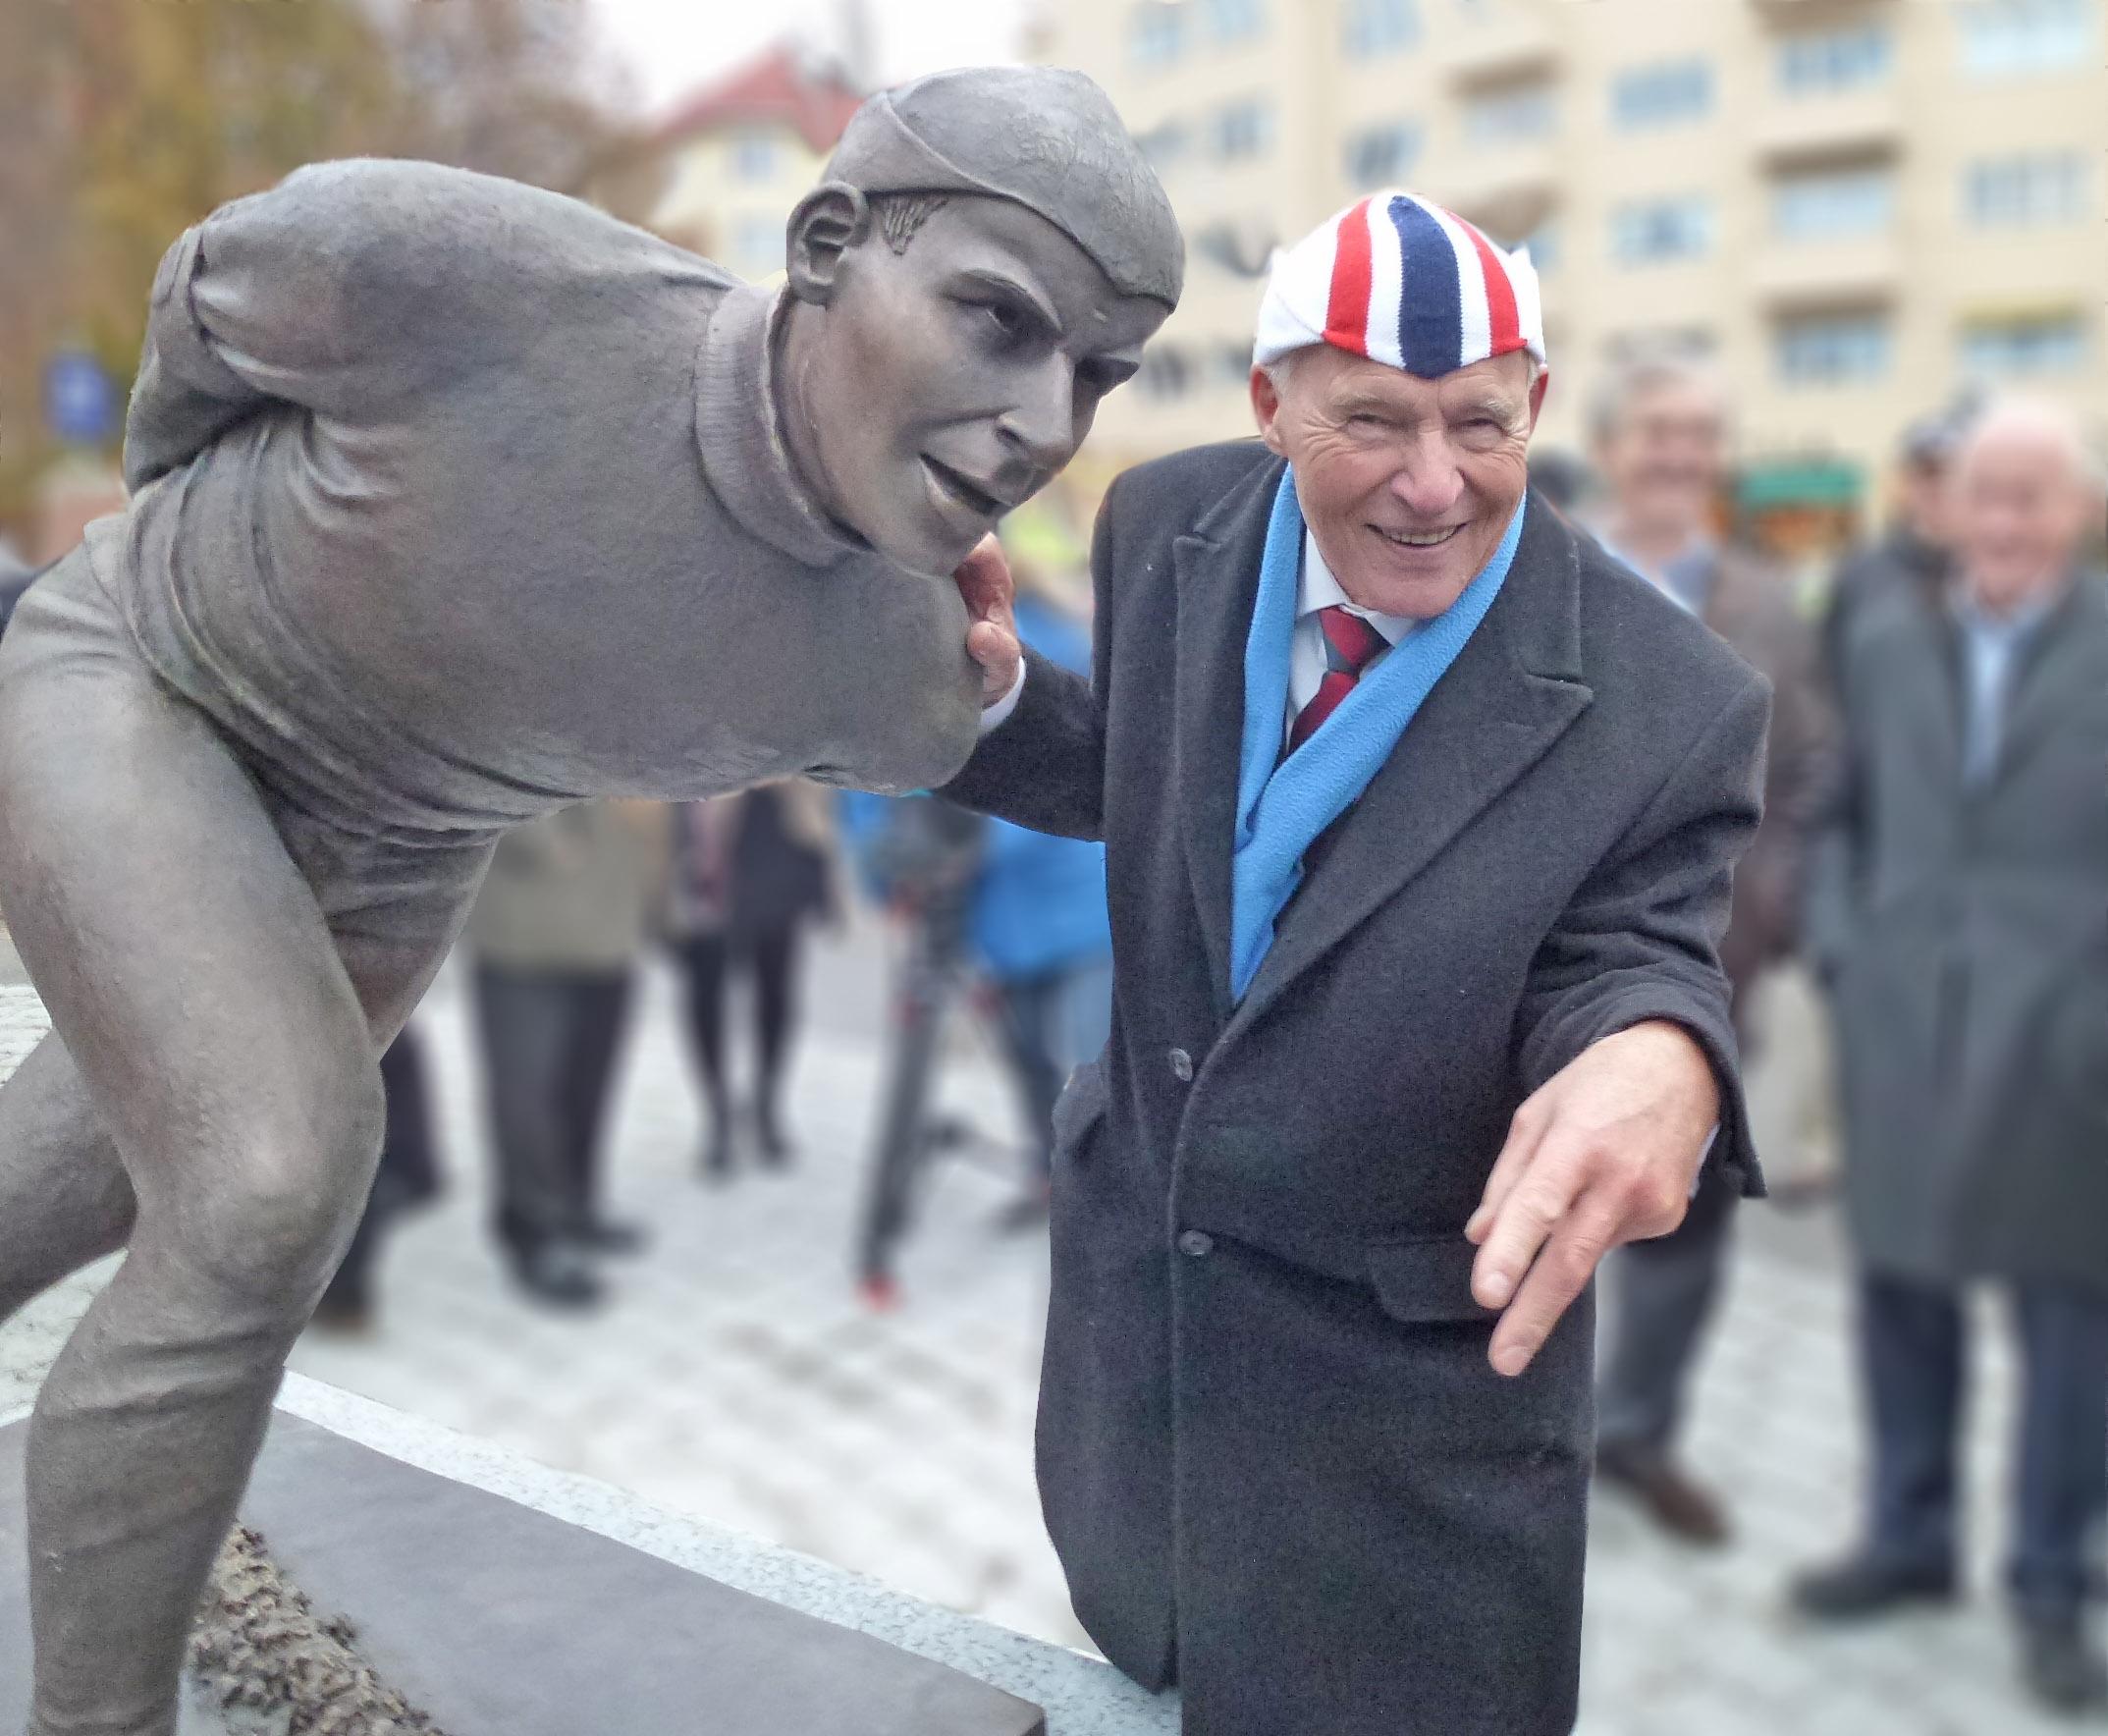 Knut Johannesen under avdukningen av statuen av ham foran Bislet stadion i 2013. (Foto: Sven-Åge Svensson)